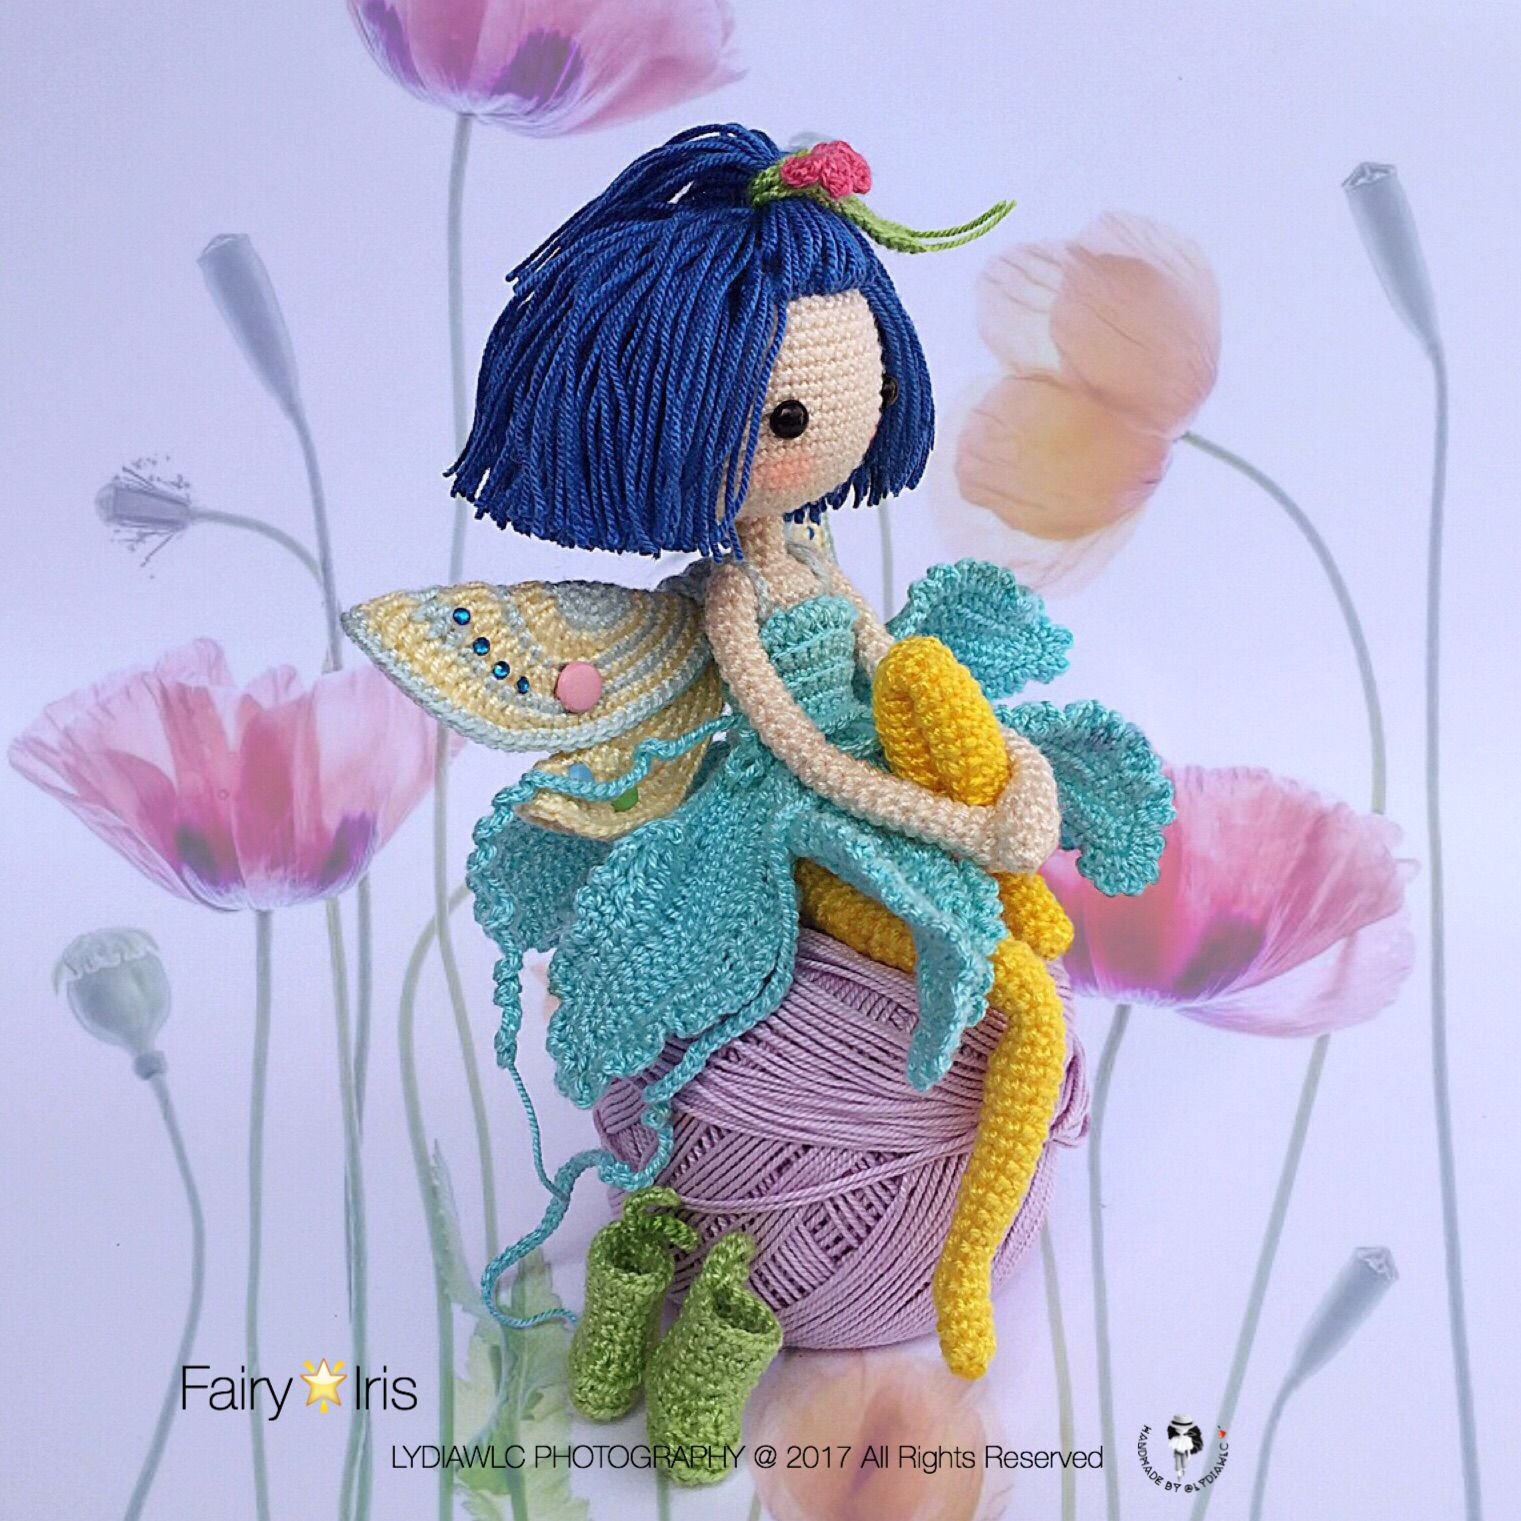 Fairyiris english pdf crochet pattern available at etsy shop fairyiris english pdf crochet pattern available at etsy shop crochet doll fairy bankloansurffo Gallery